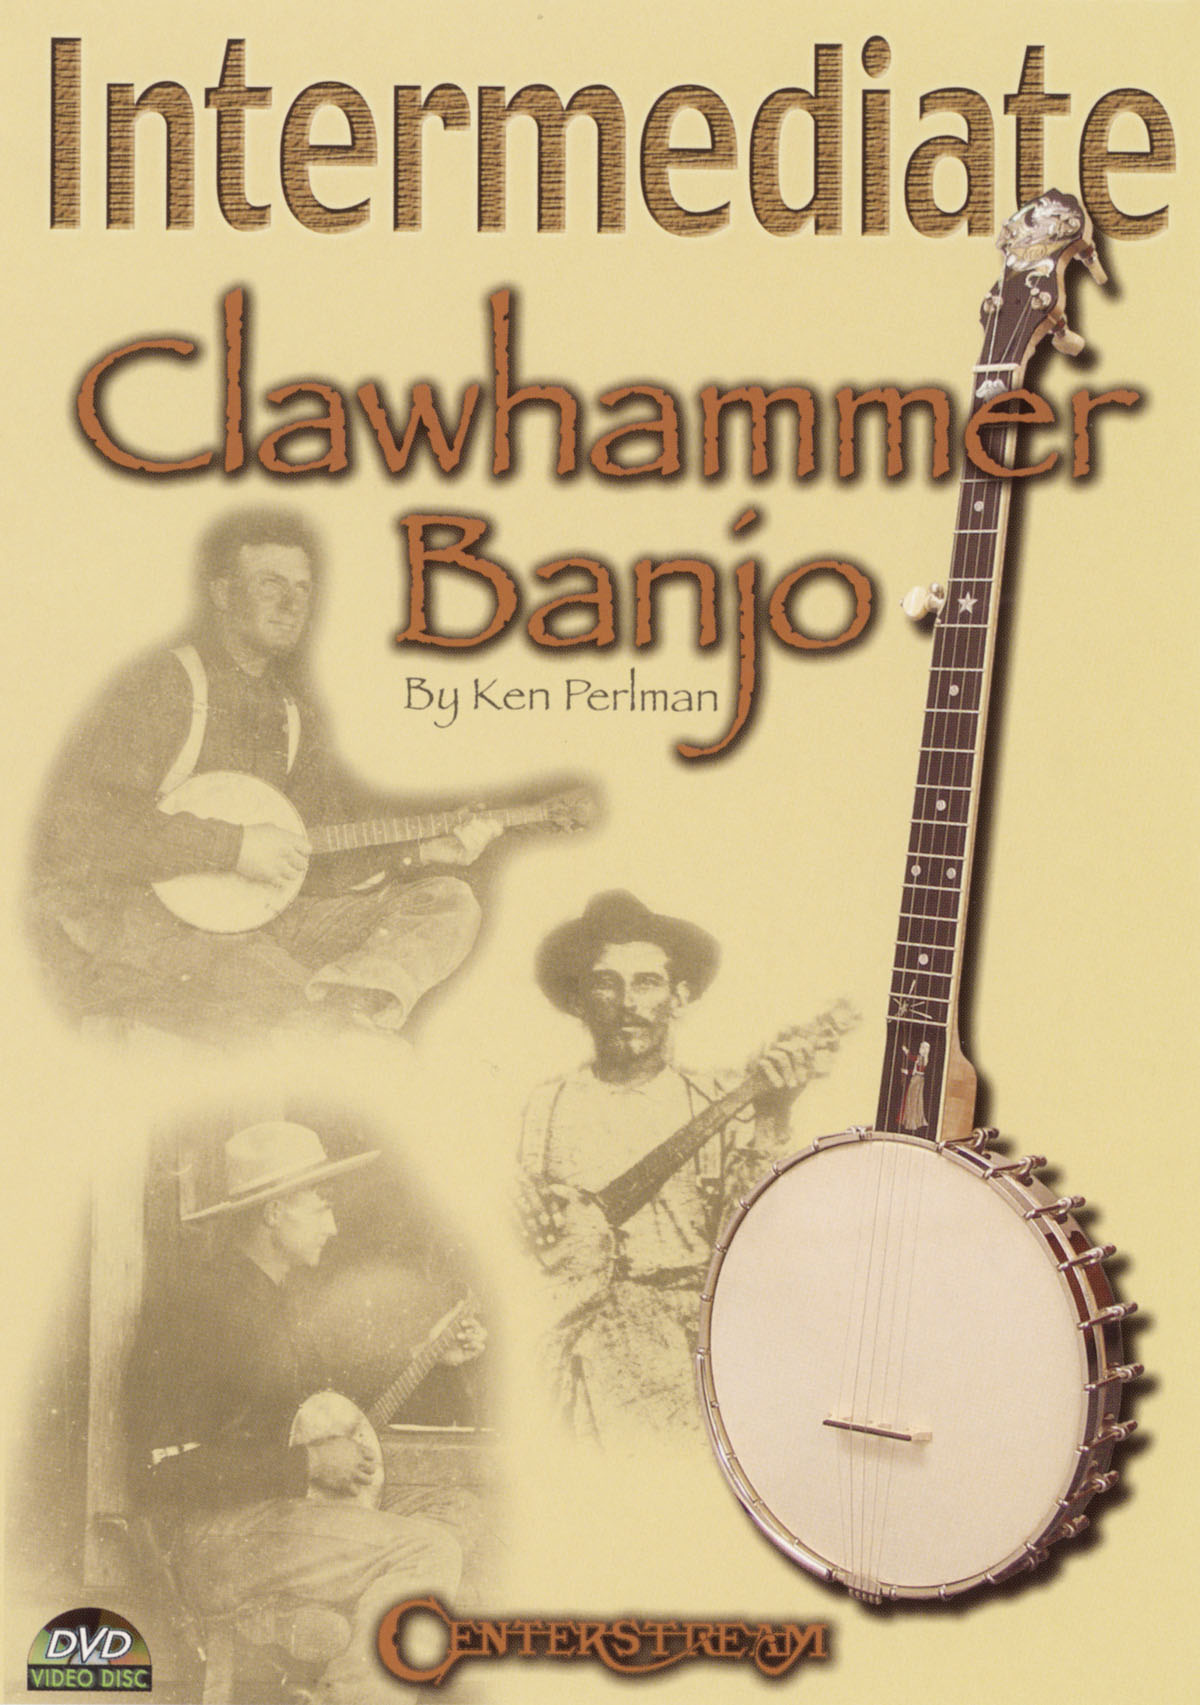 Intermediate Clawhammer Banjo: Banjo: Instrumental Tutor